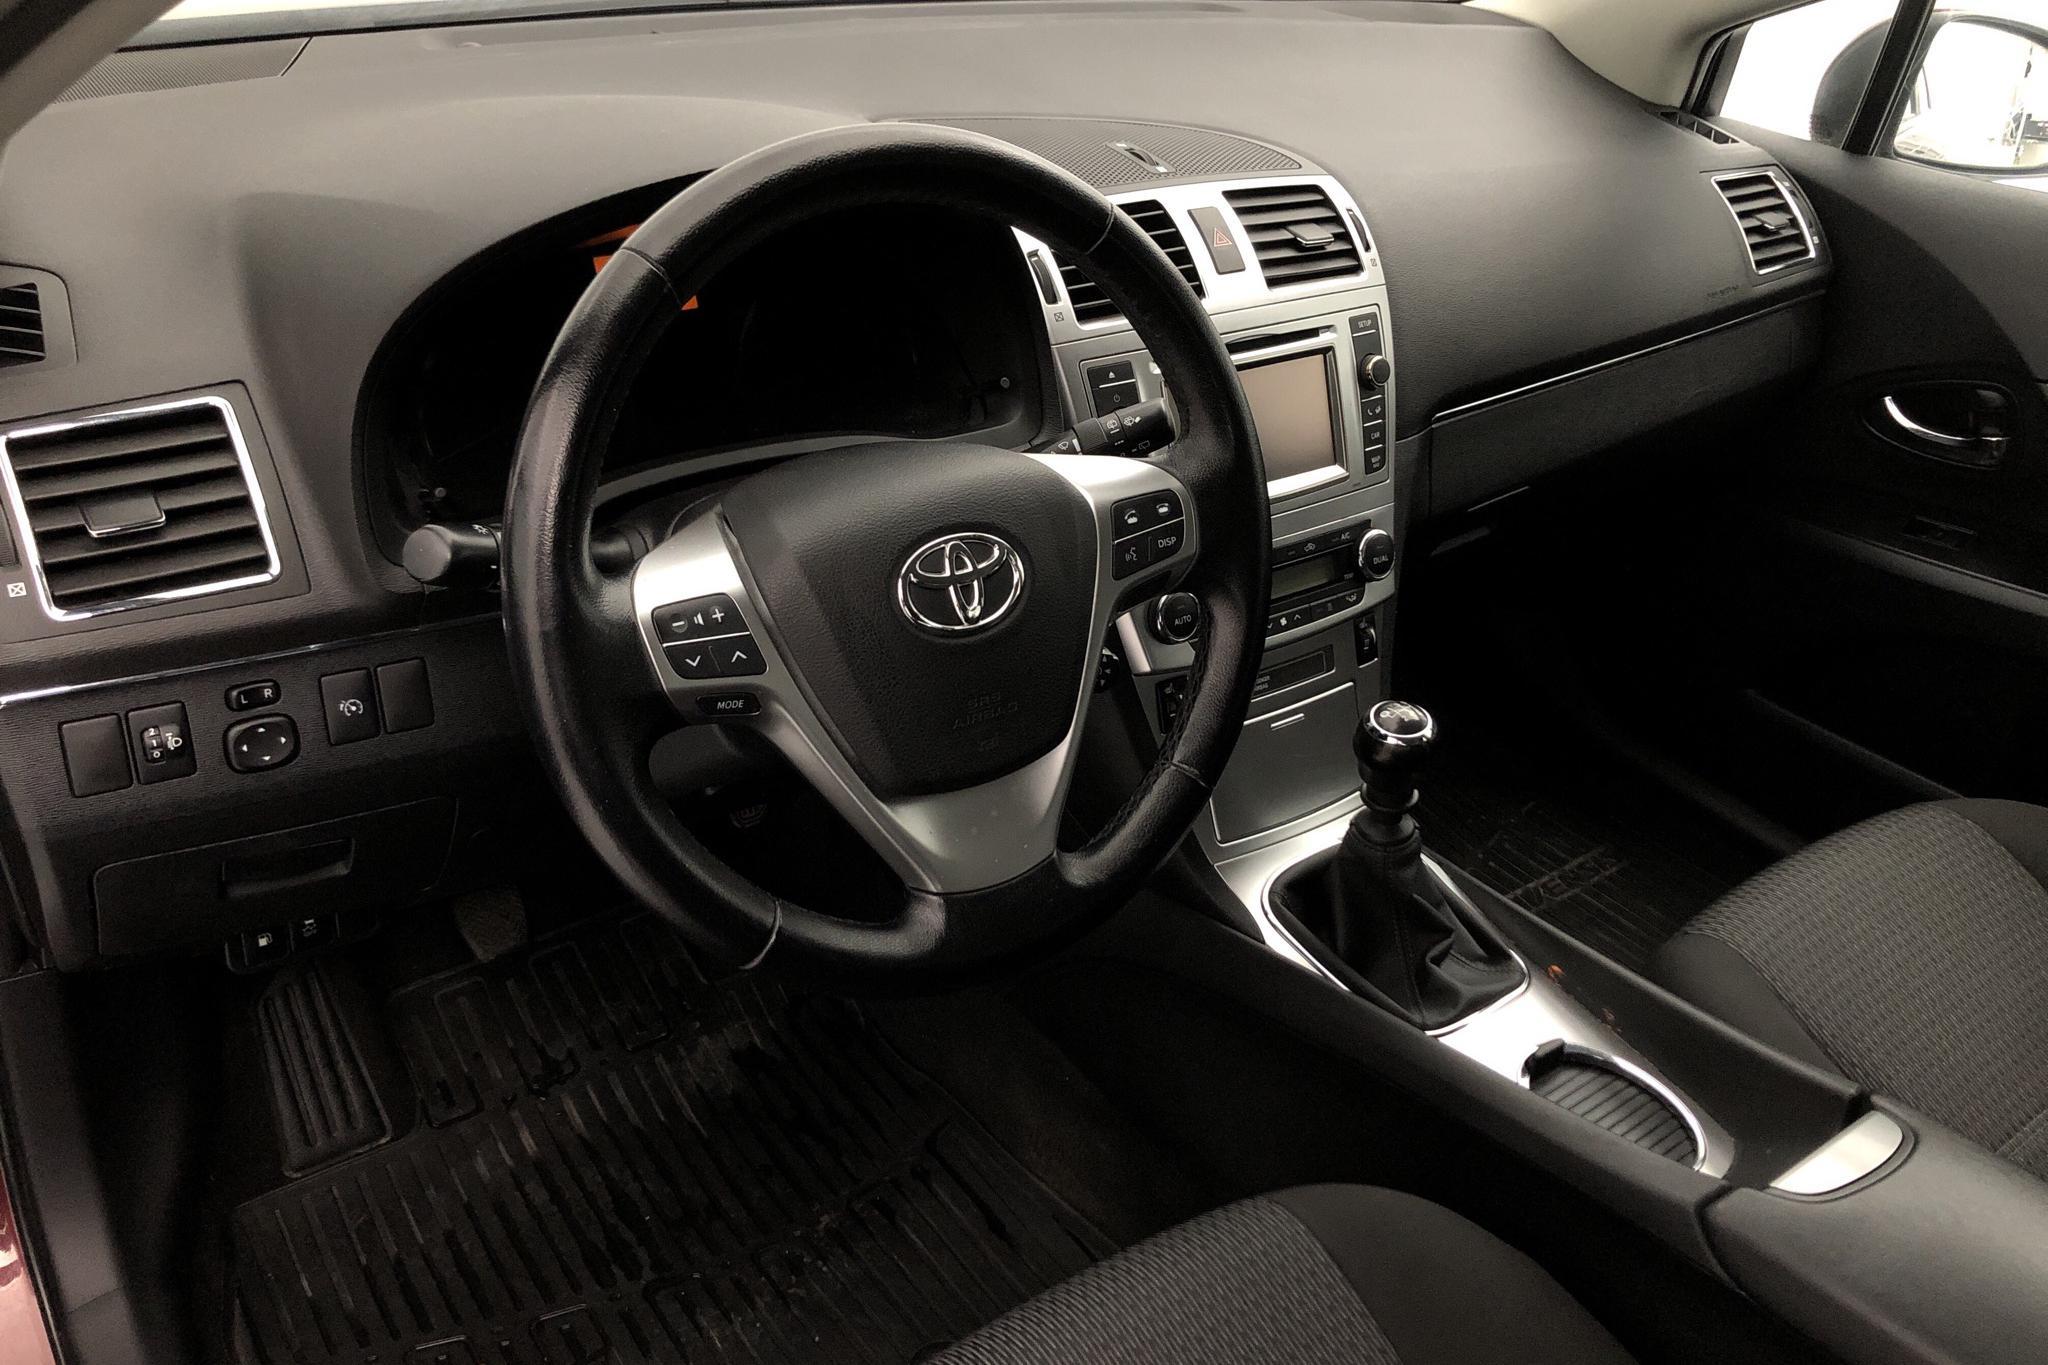 Toyota Avensis 2.0 D-4D Kombi (124hk) - 13 229 mil - Manuell - Dark Red - 2012